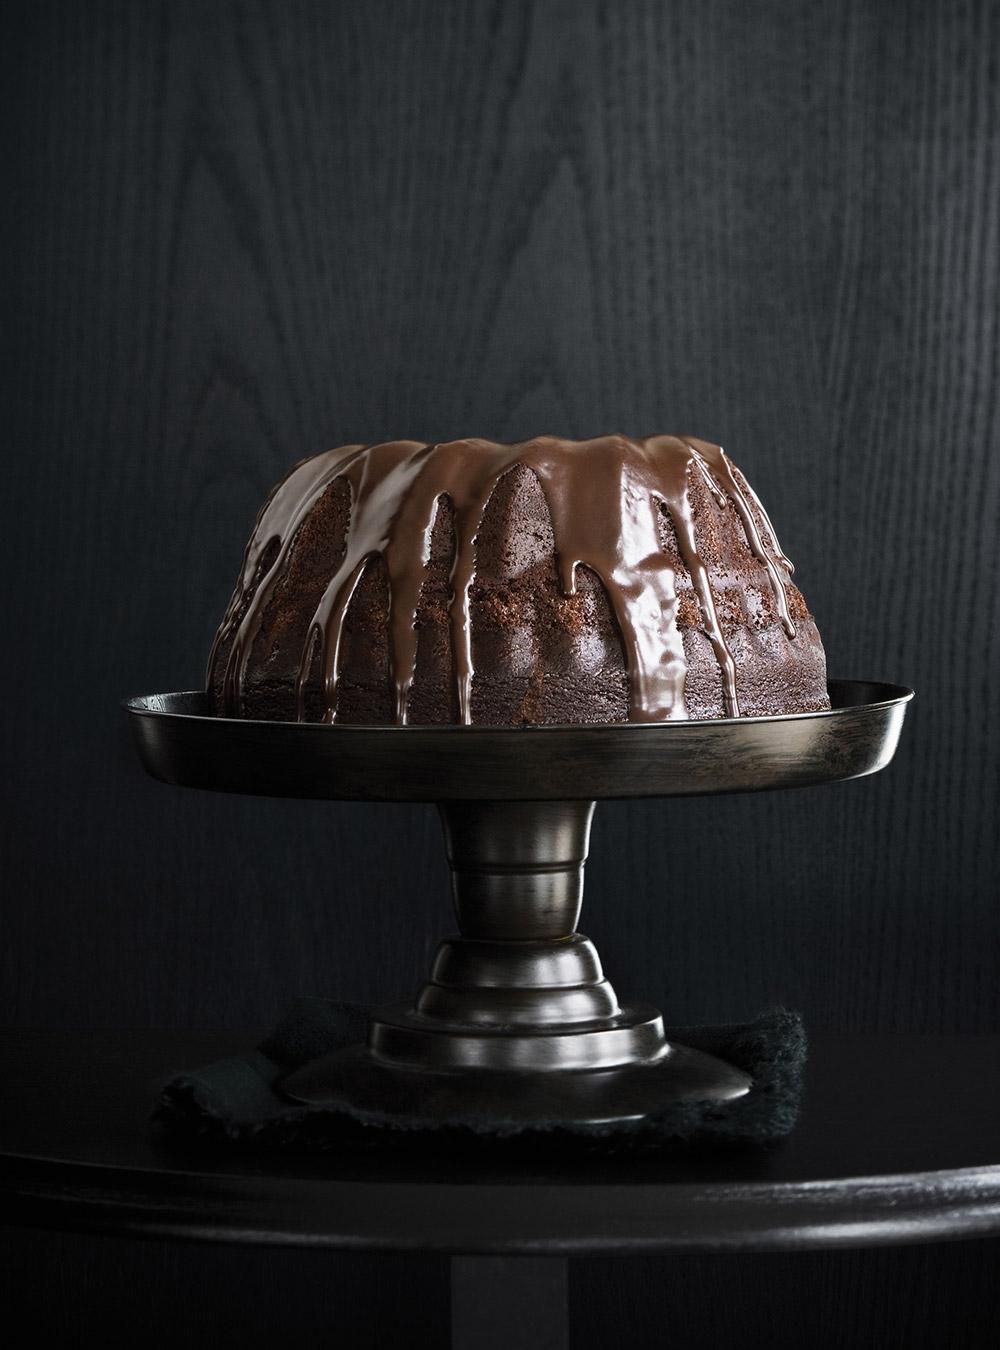 Gâteau au chocolat devil's food cake | ricardo